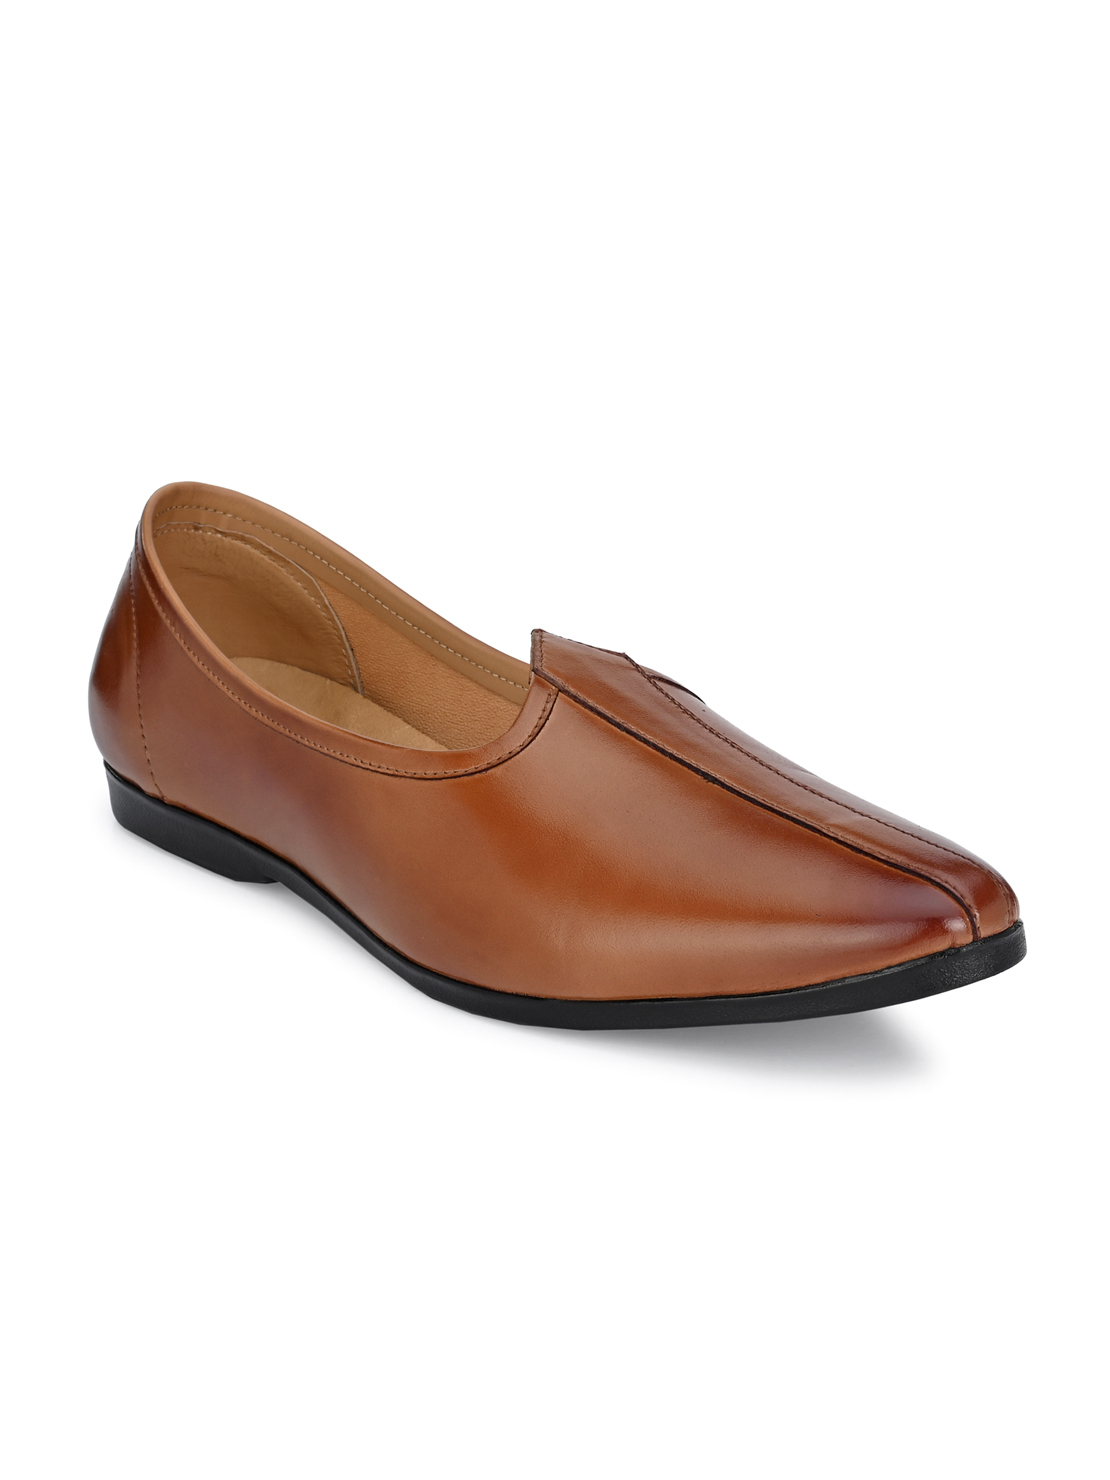 Guava | Guava Men's Genuine Leather Jalsa Ethnic Mojris Shoes - Tan